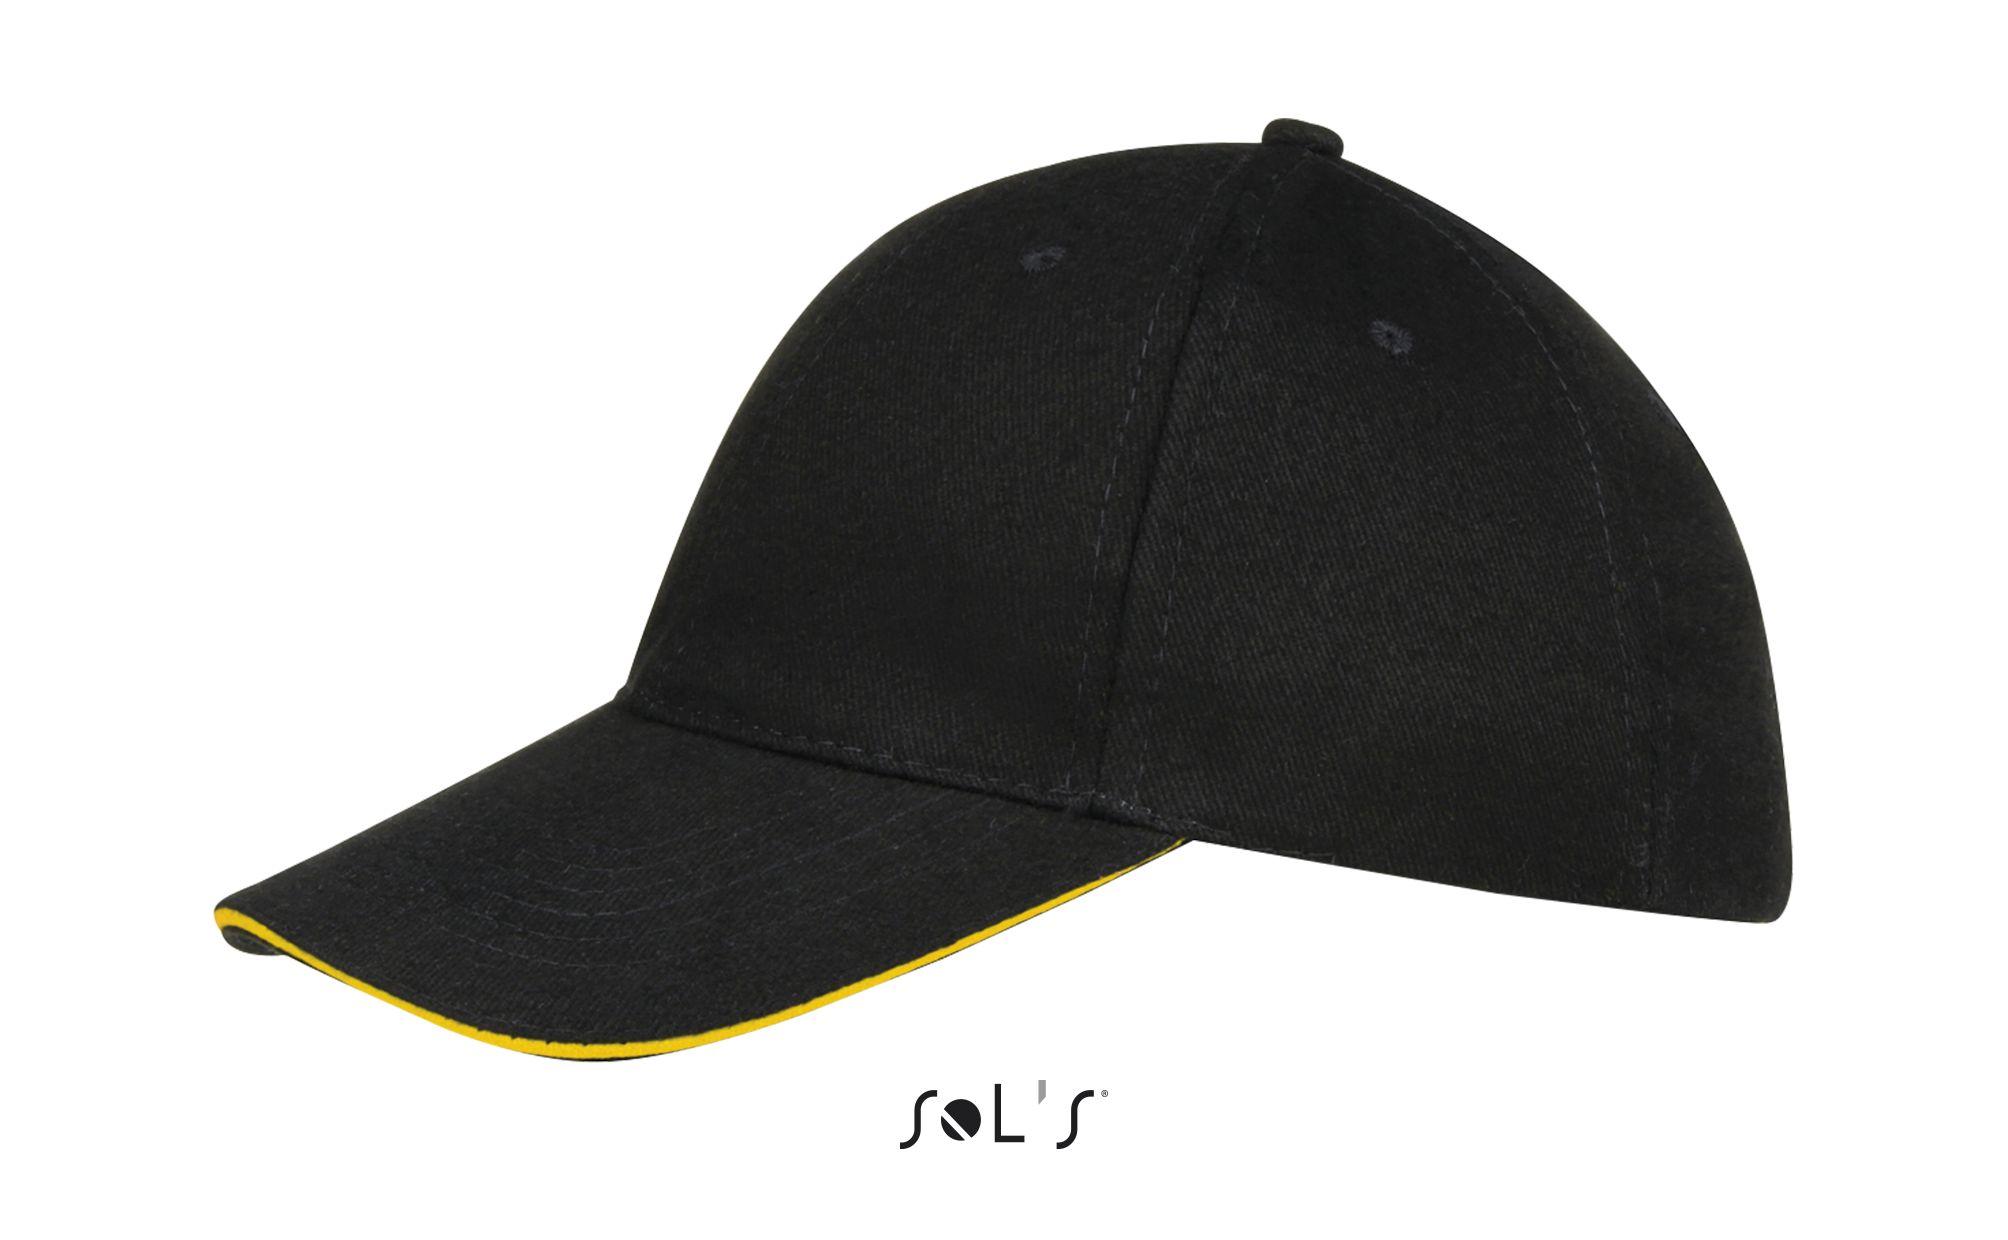 984 - Black / Gold